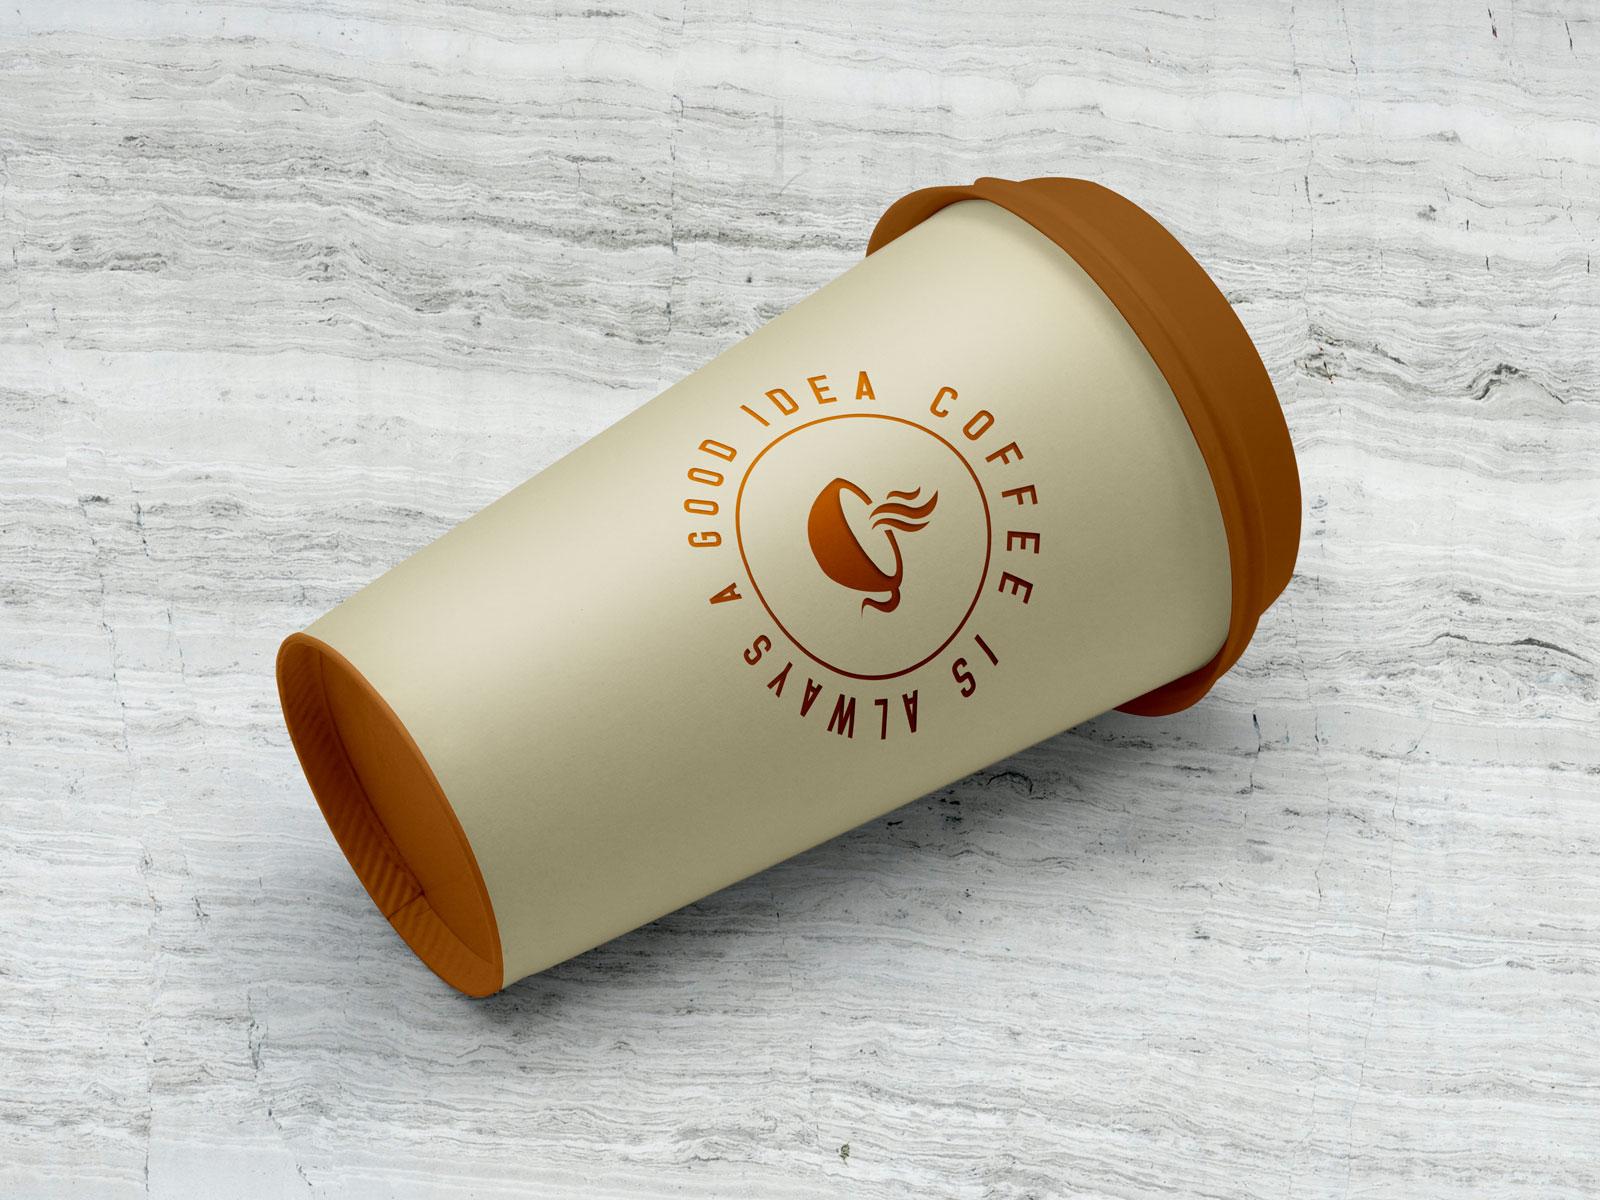 Free-Coffee-Cup-Lying-on-Floor-Mockup-PSD